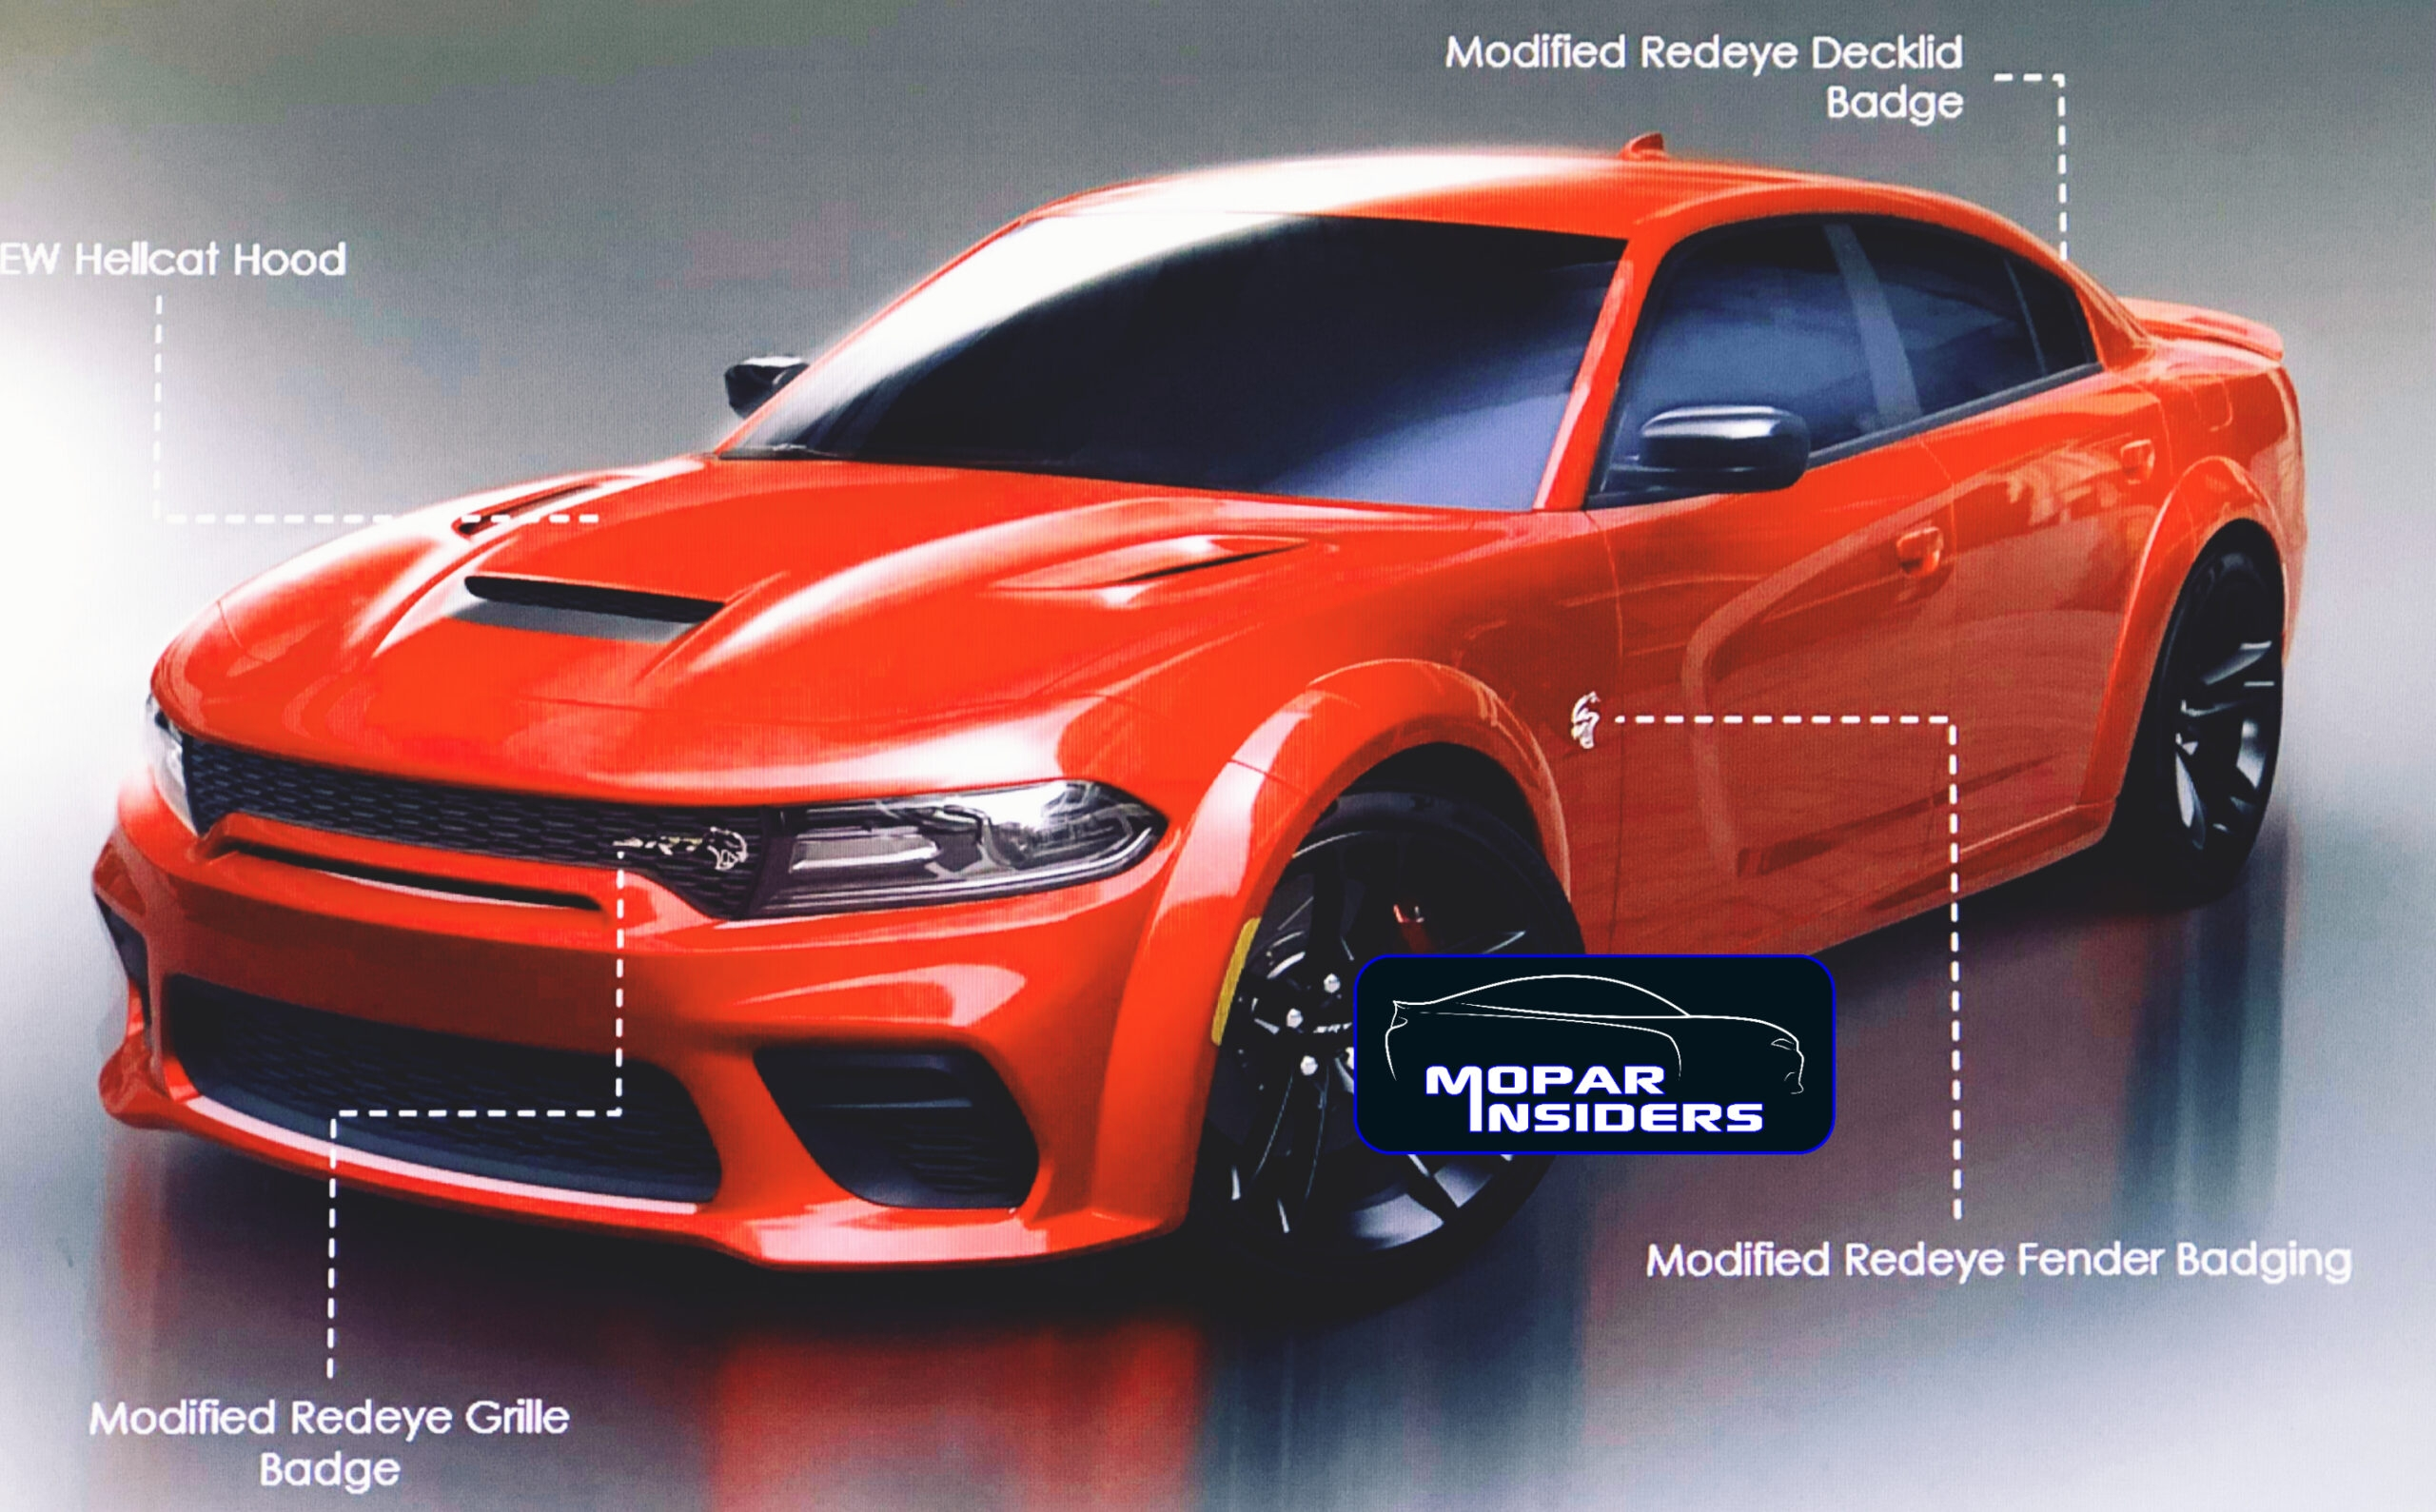 Dodge Charger SRT Hellcat 2021 ed Hellcat Redeye foto